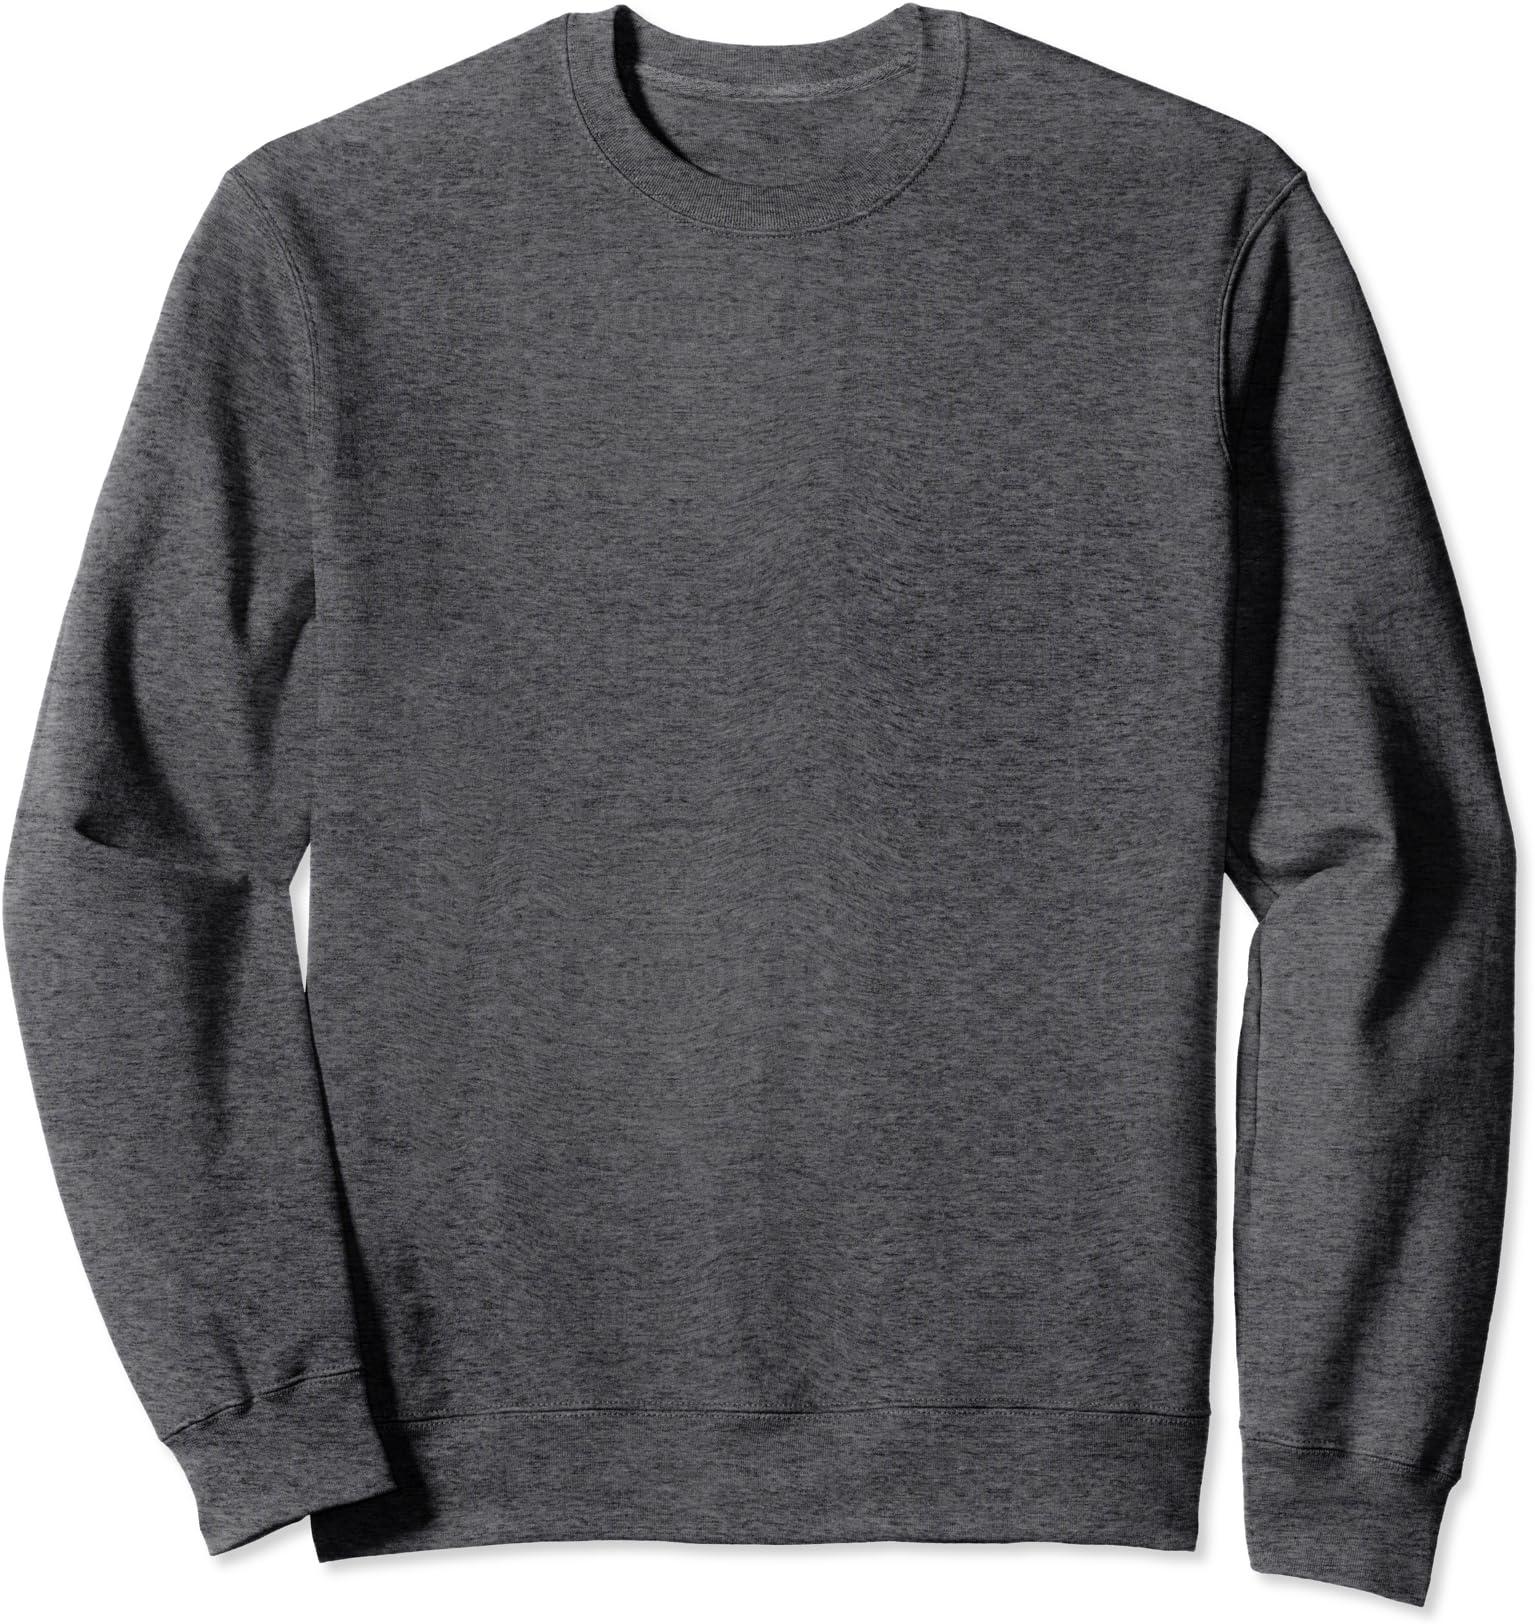 Arizona State Shirt Athletic Wear USA T Novelty Gift Ideas Sweatshirt